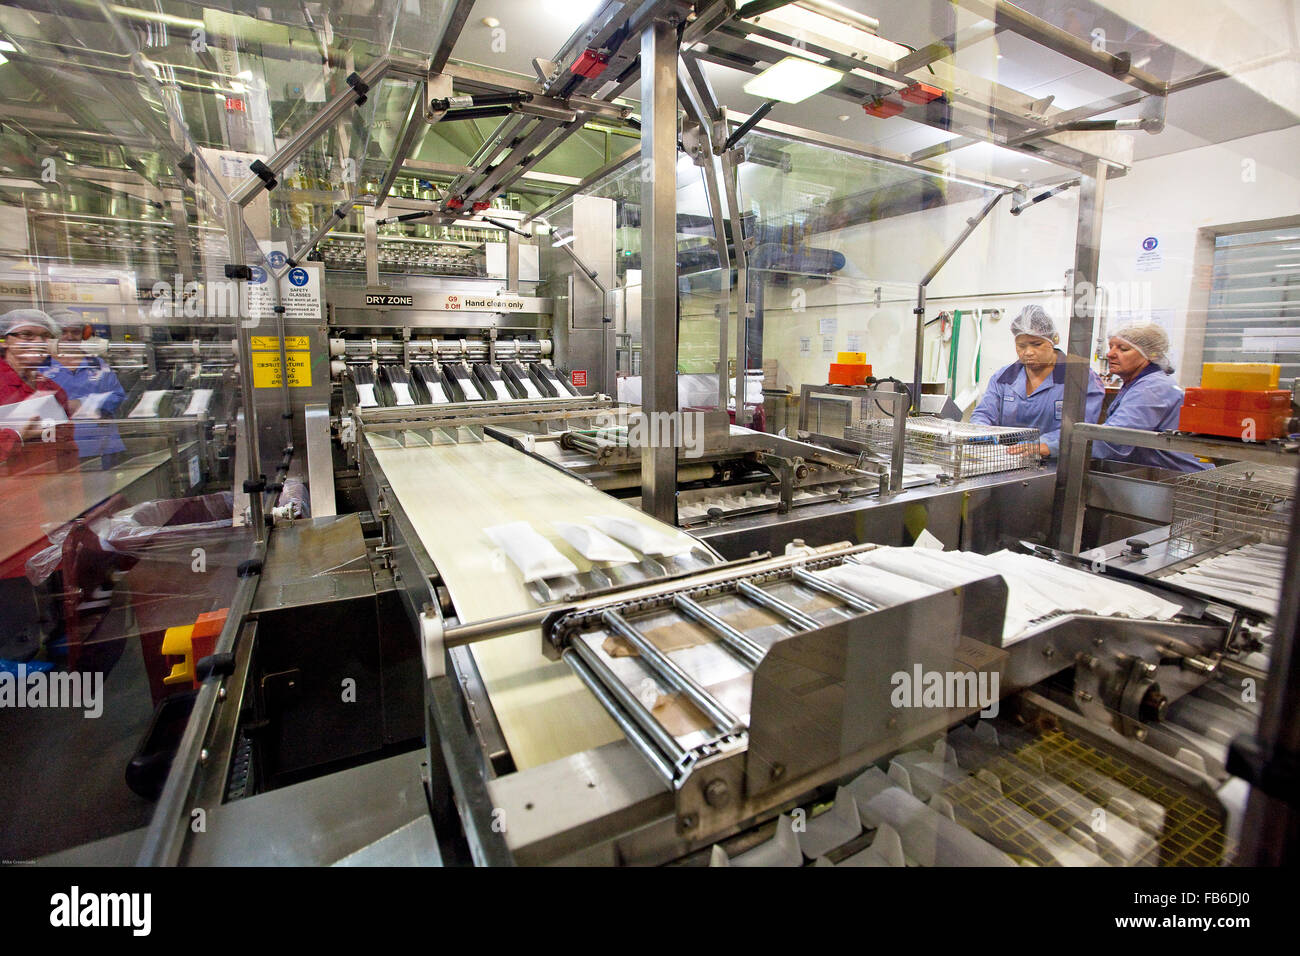 Produktionslinie in Norco Eis Fabrik, Lismore, NSW, Australien Stockbild